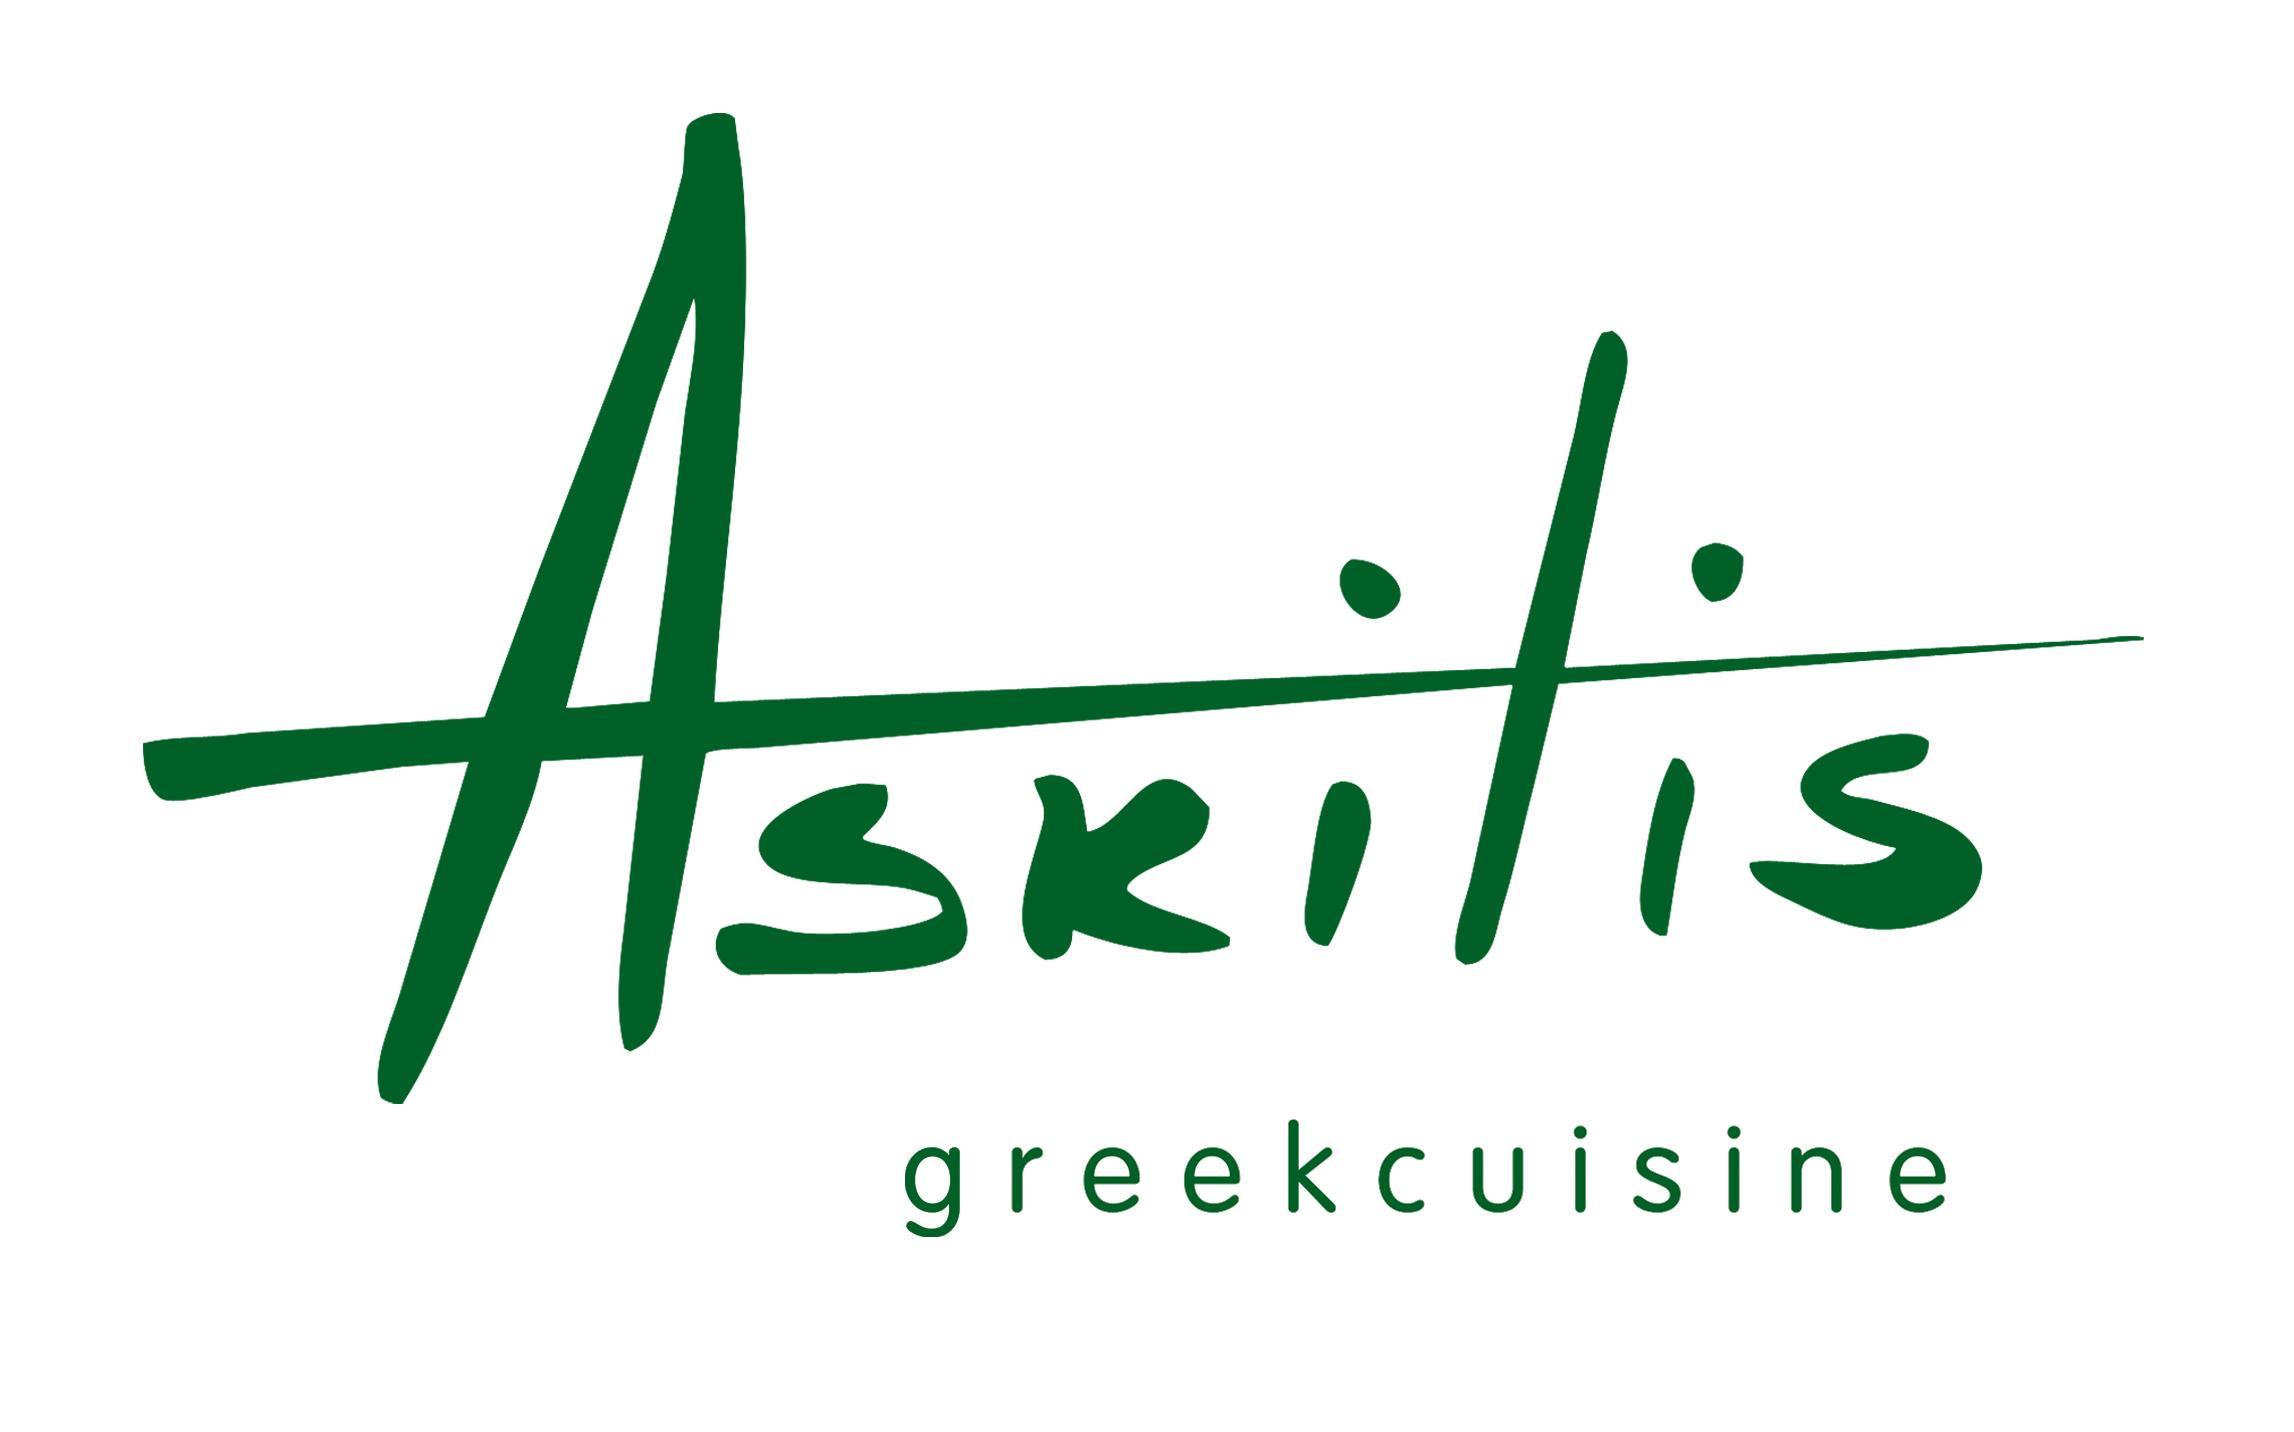 Askitis greekcuisine